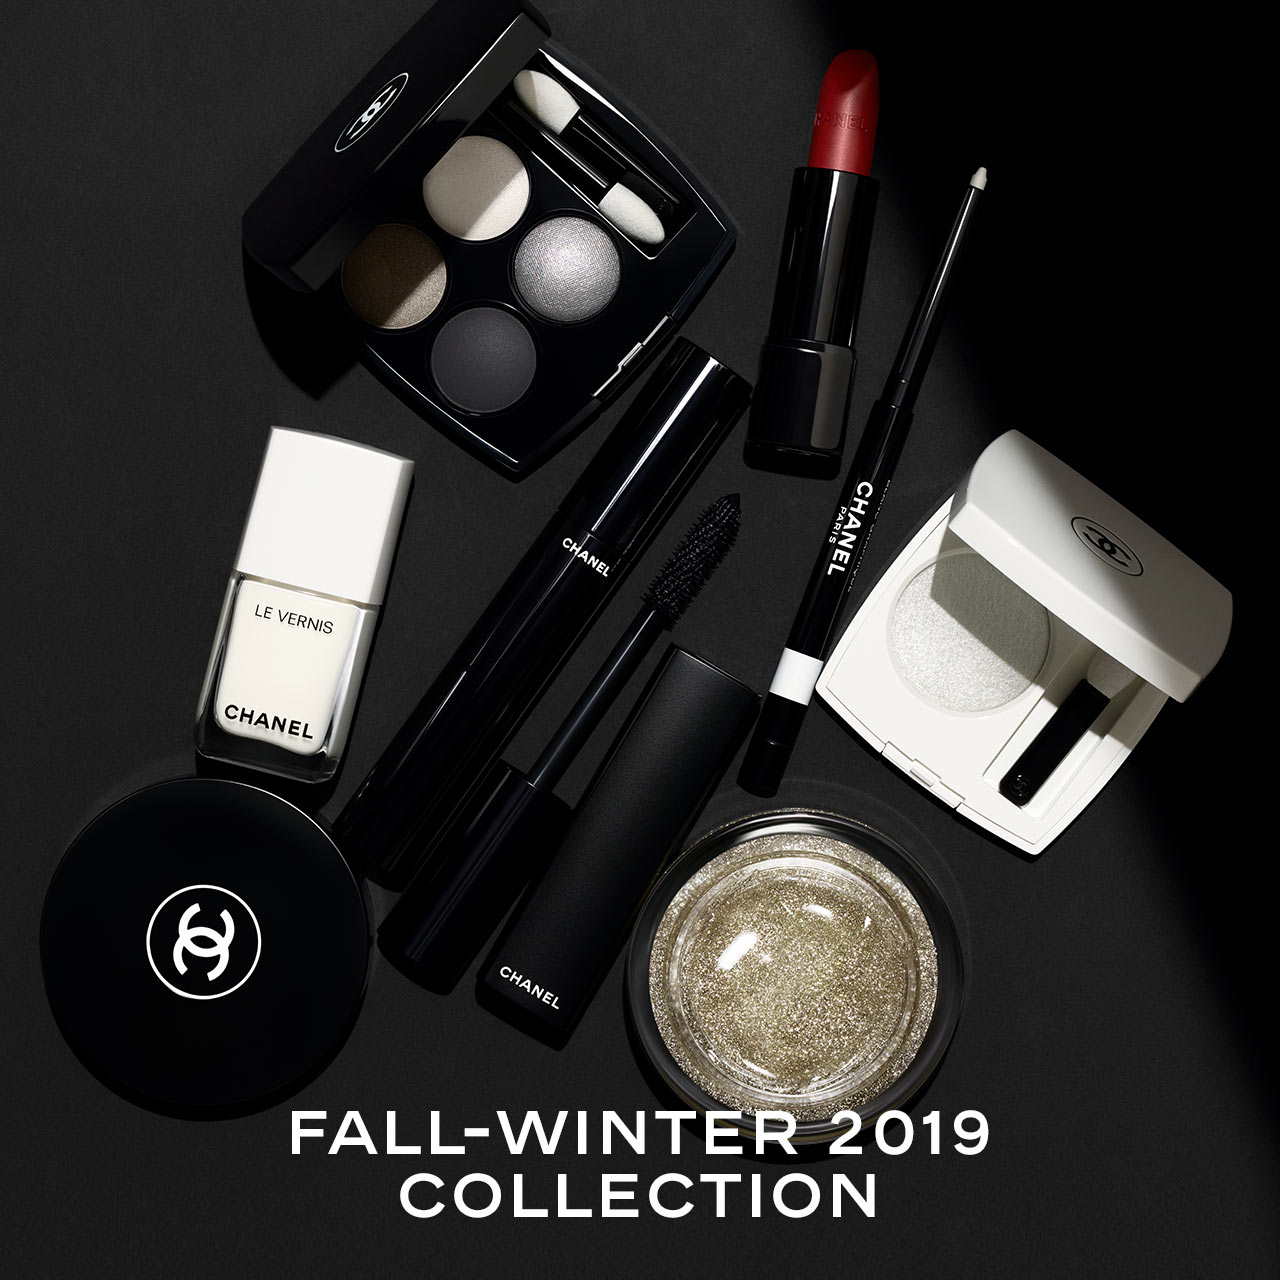 Chanel jesen-zima 2019 Makeup kolekcija